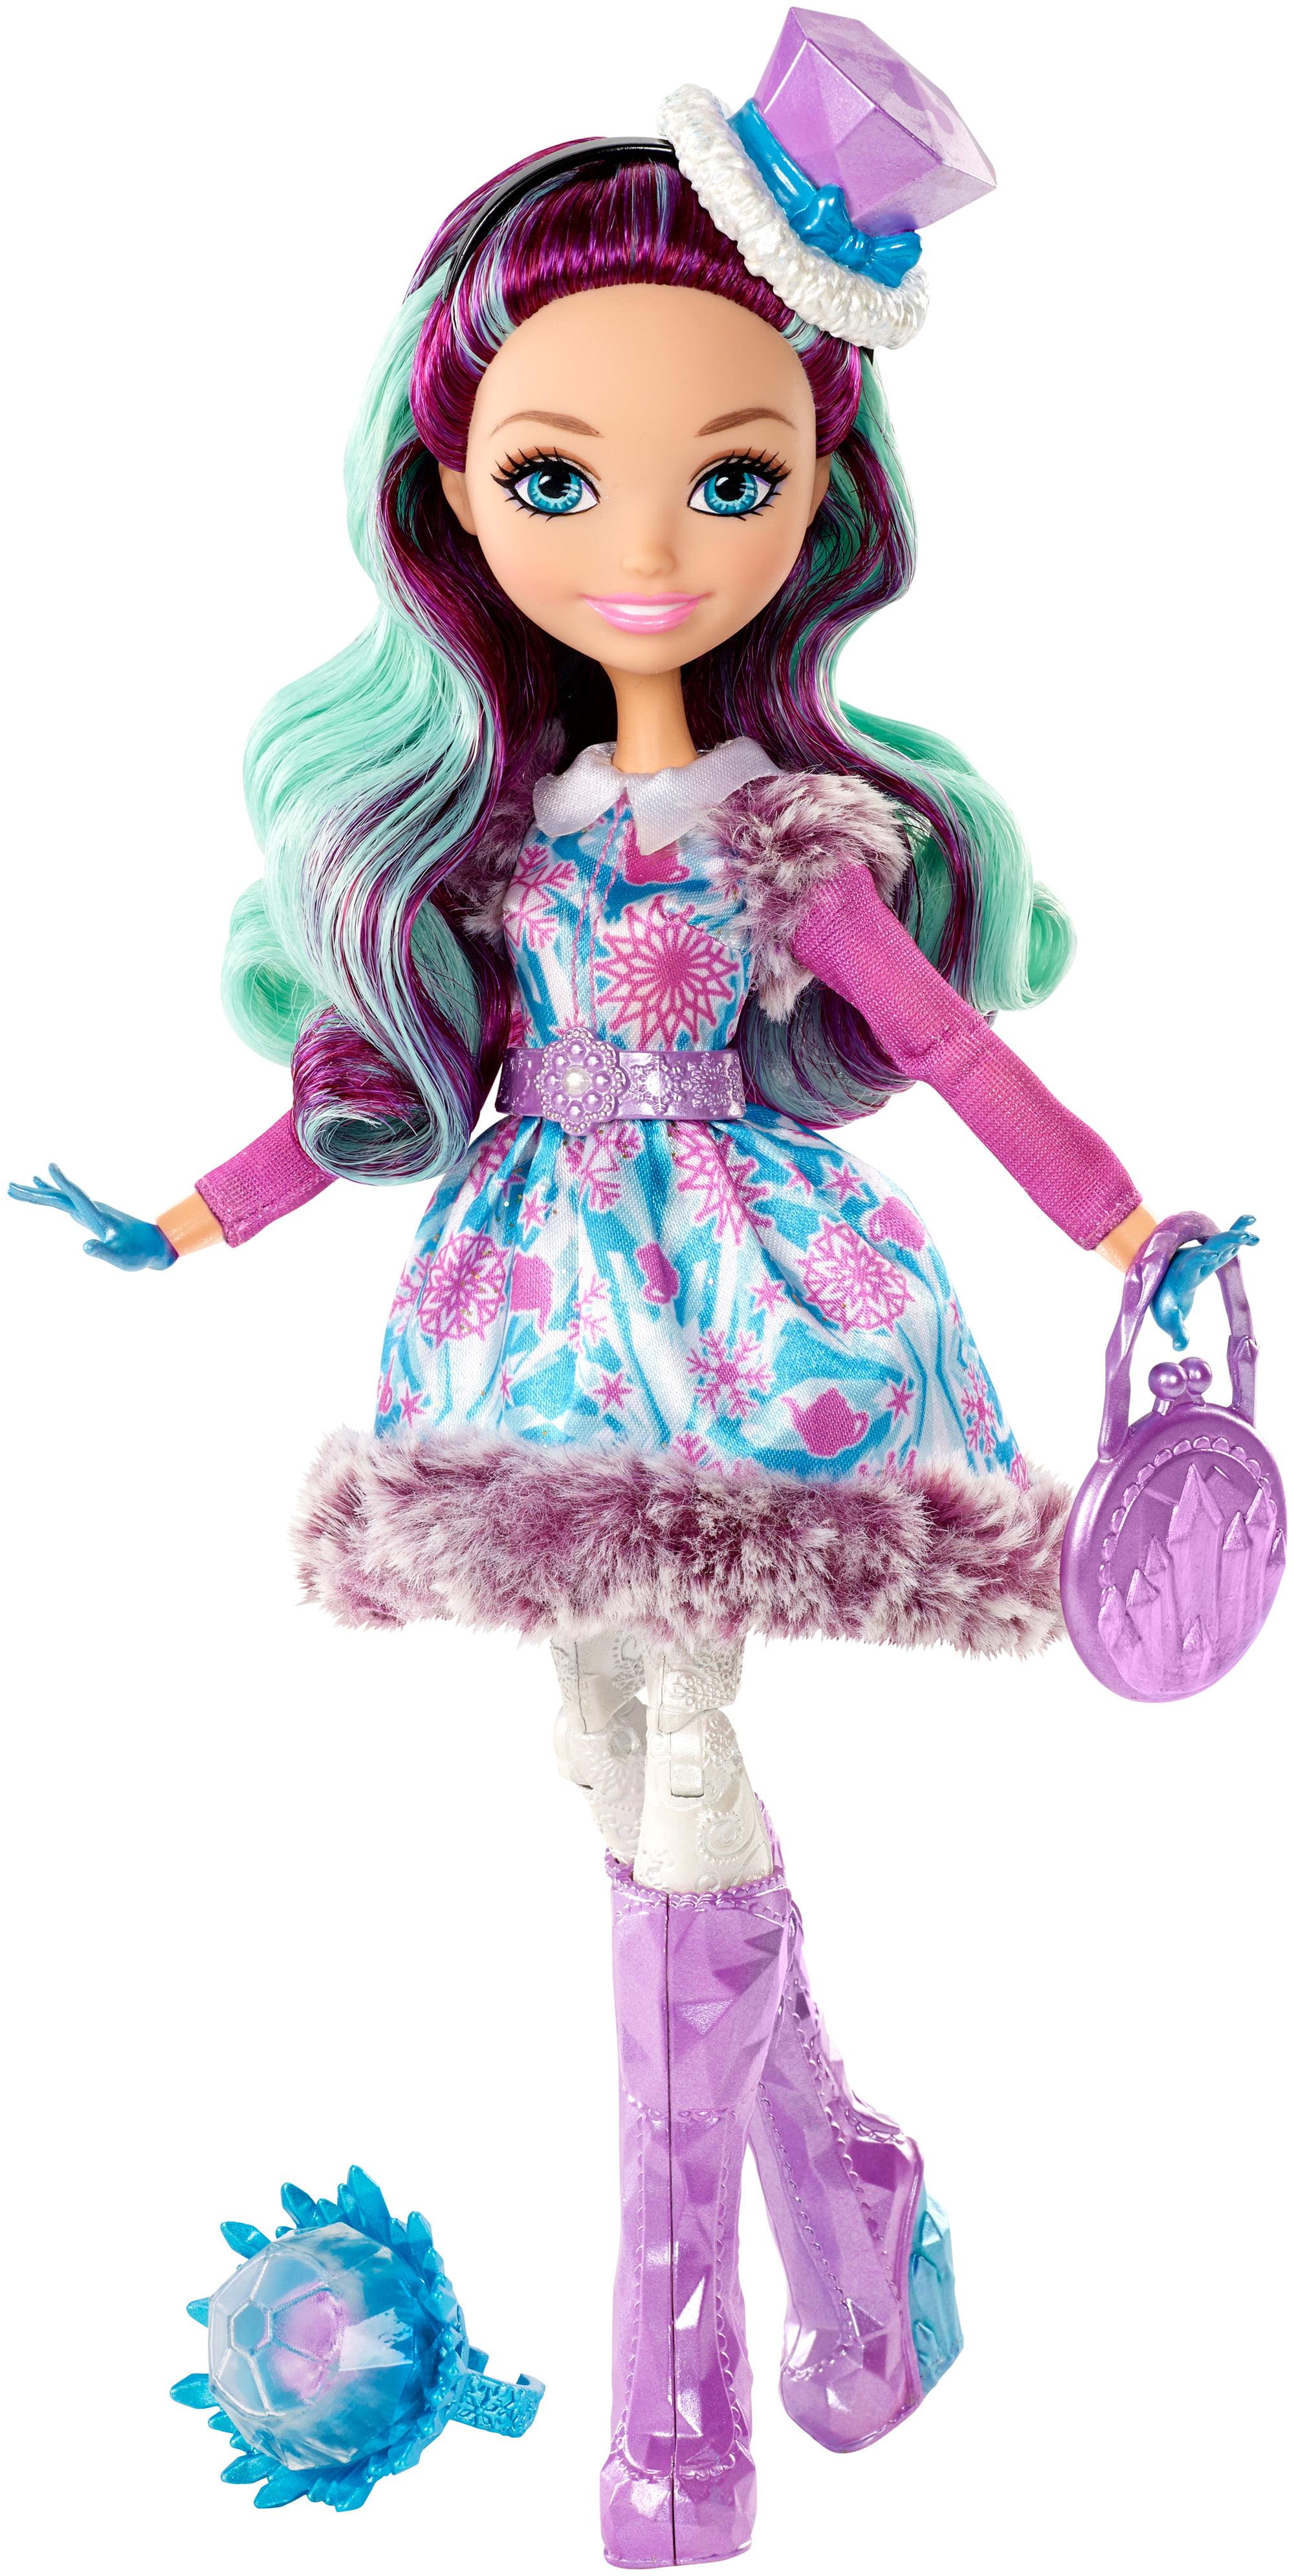 Ever After High Epic Winter Madeline Hatter Doll by MATTEL INC.